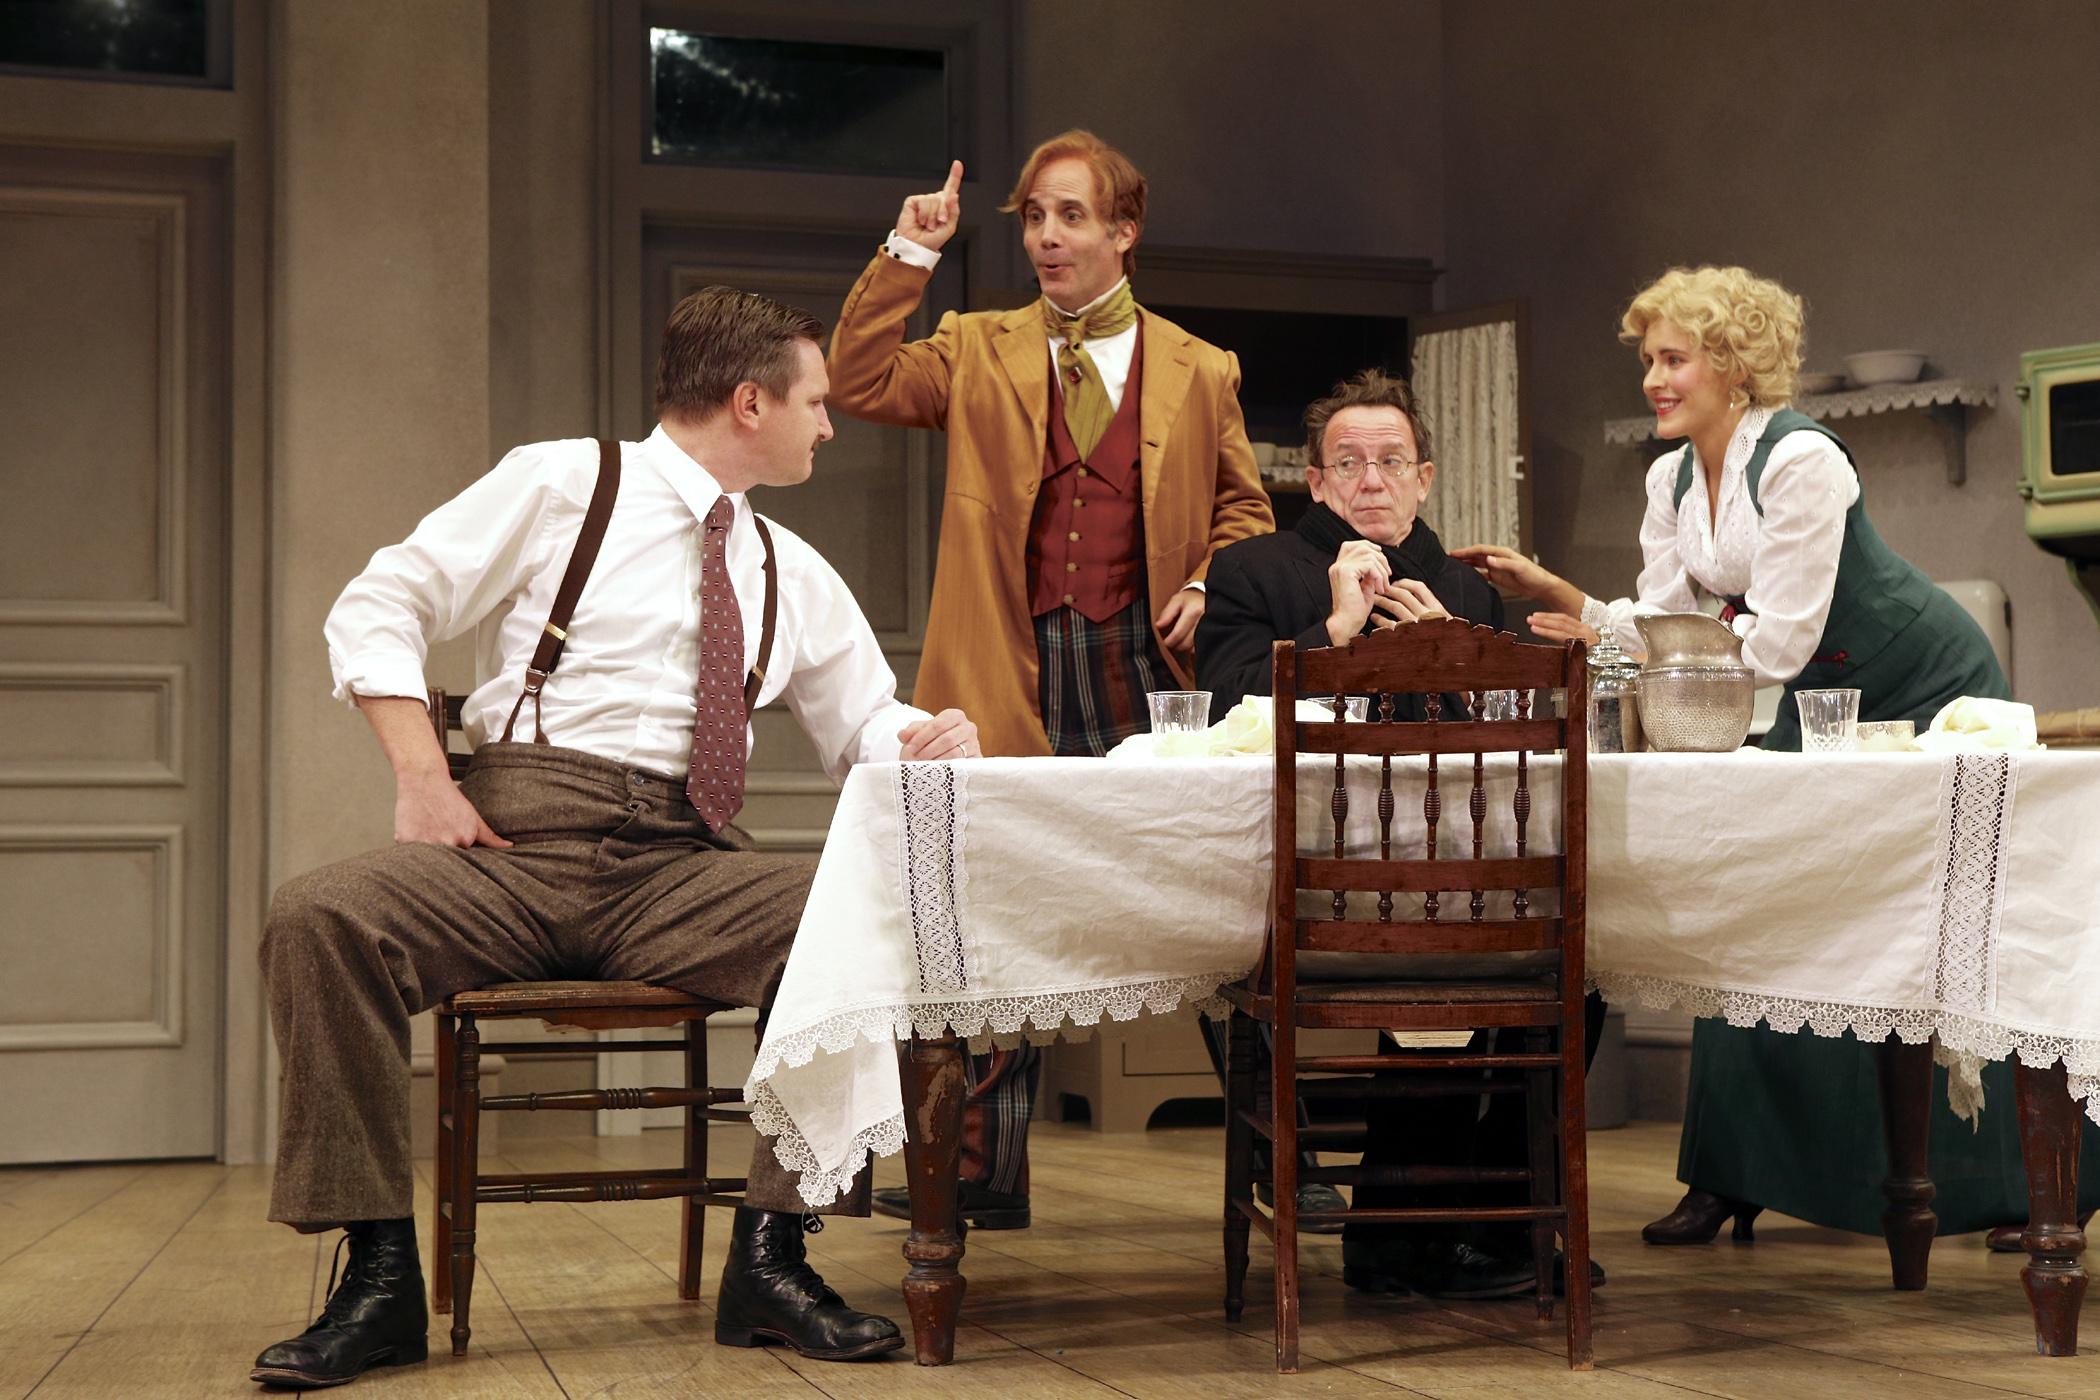 Theo Maske (Mark David Watson), Versati (Daniel Passer), and Benjamin Cohen (Michael Brian Dunn) make a fuss over Louise Maske's (Marianna McClellan) underpants ordeal